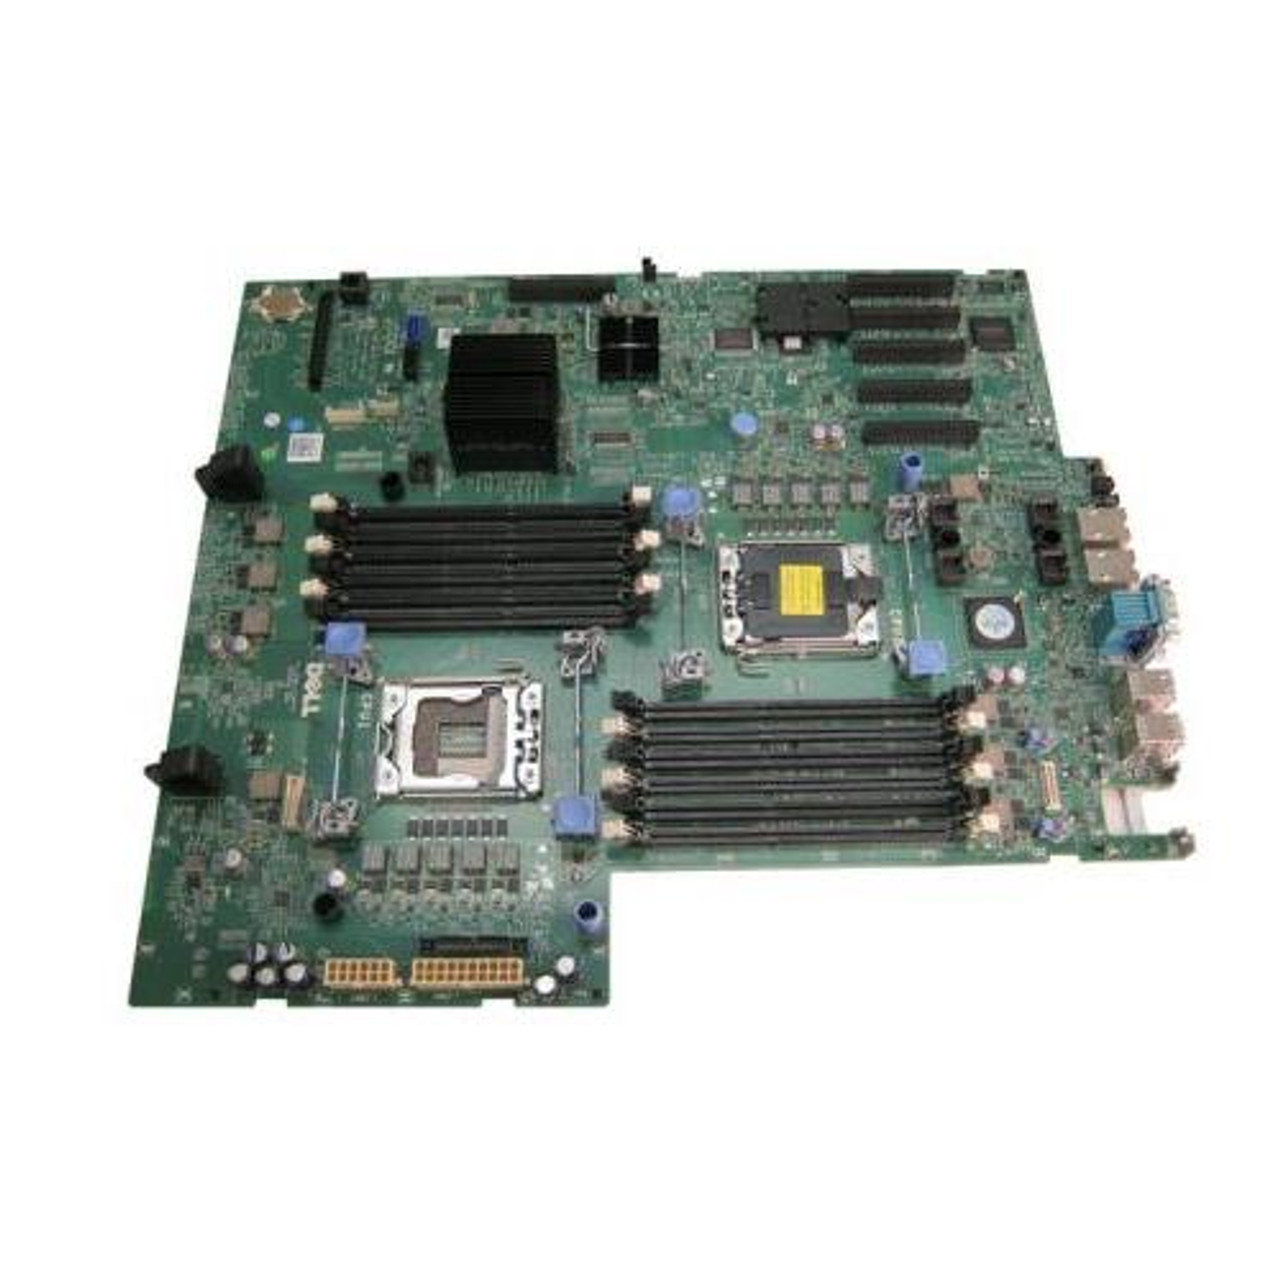 Dell Poweredge T610 Motherboard//System Board 09cgw2//9cgw2